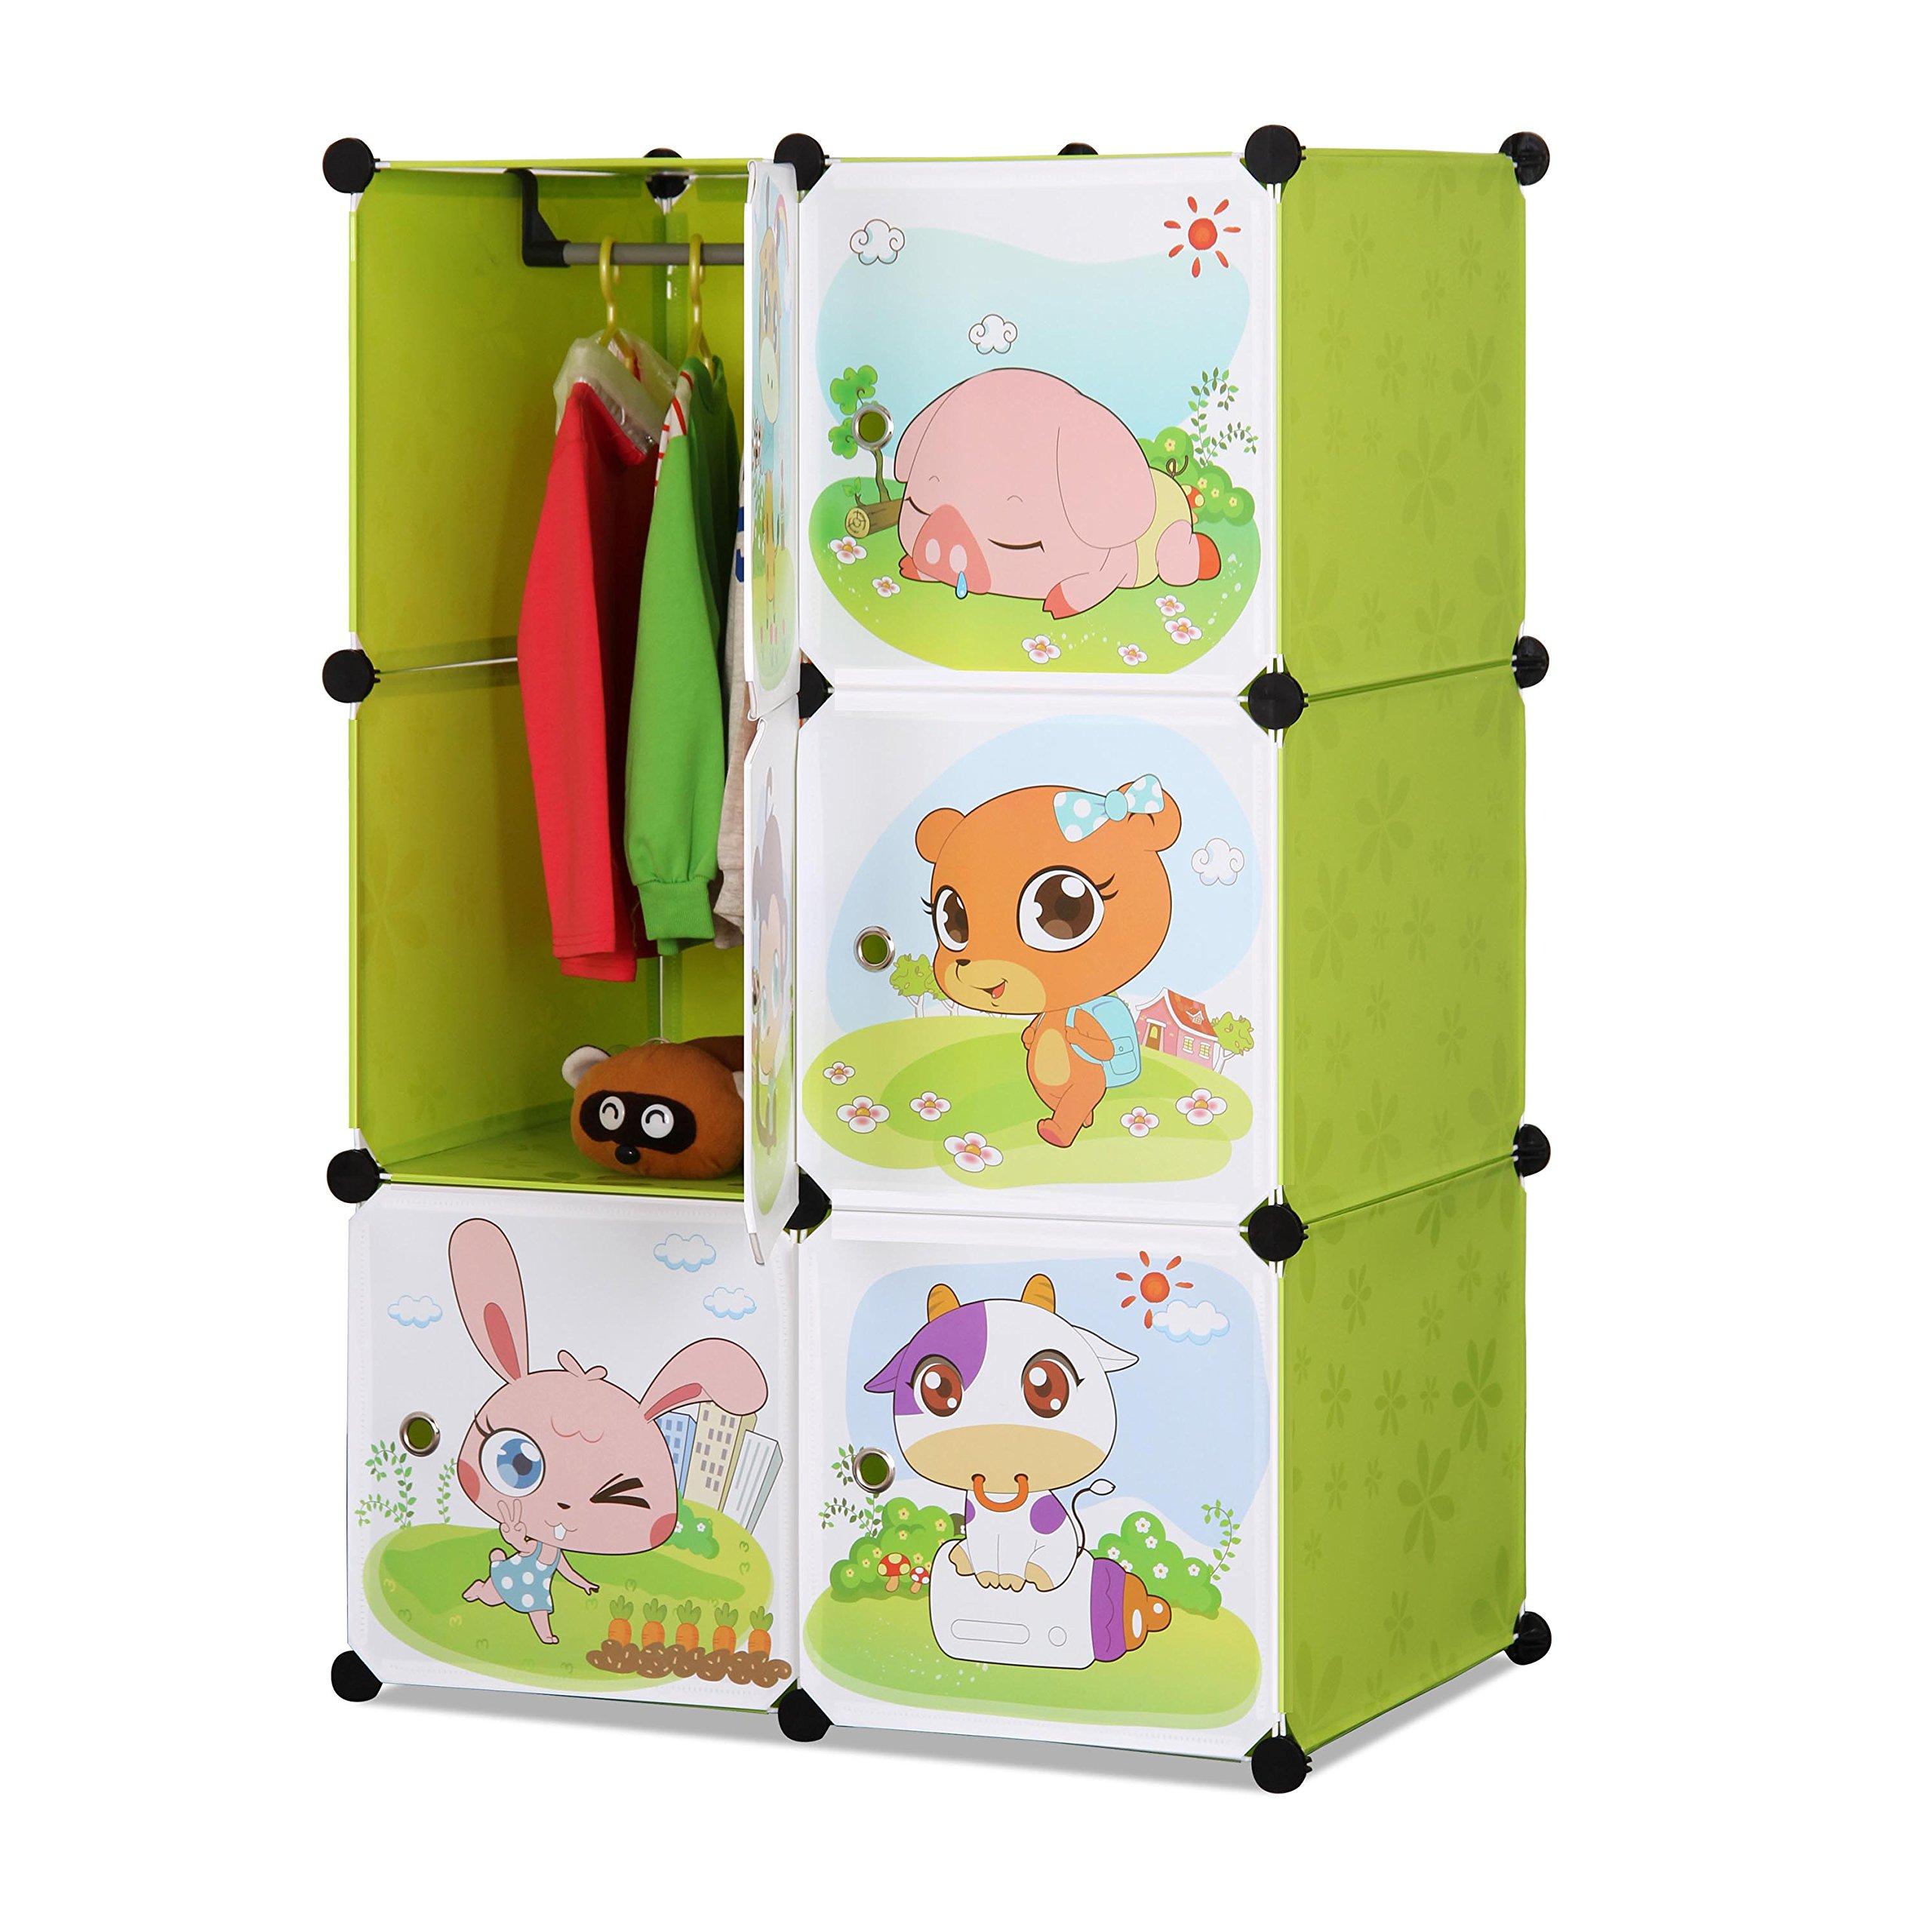 ALEKO SCAB04GR Whimsical Children's 6 Cube Interlocking Multipurpose Animal Themed Storage Organizer with Garment Rack in Green